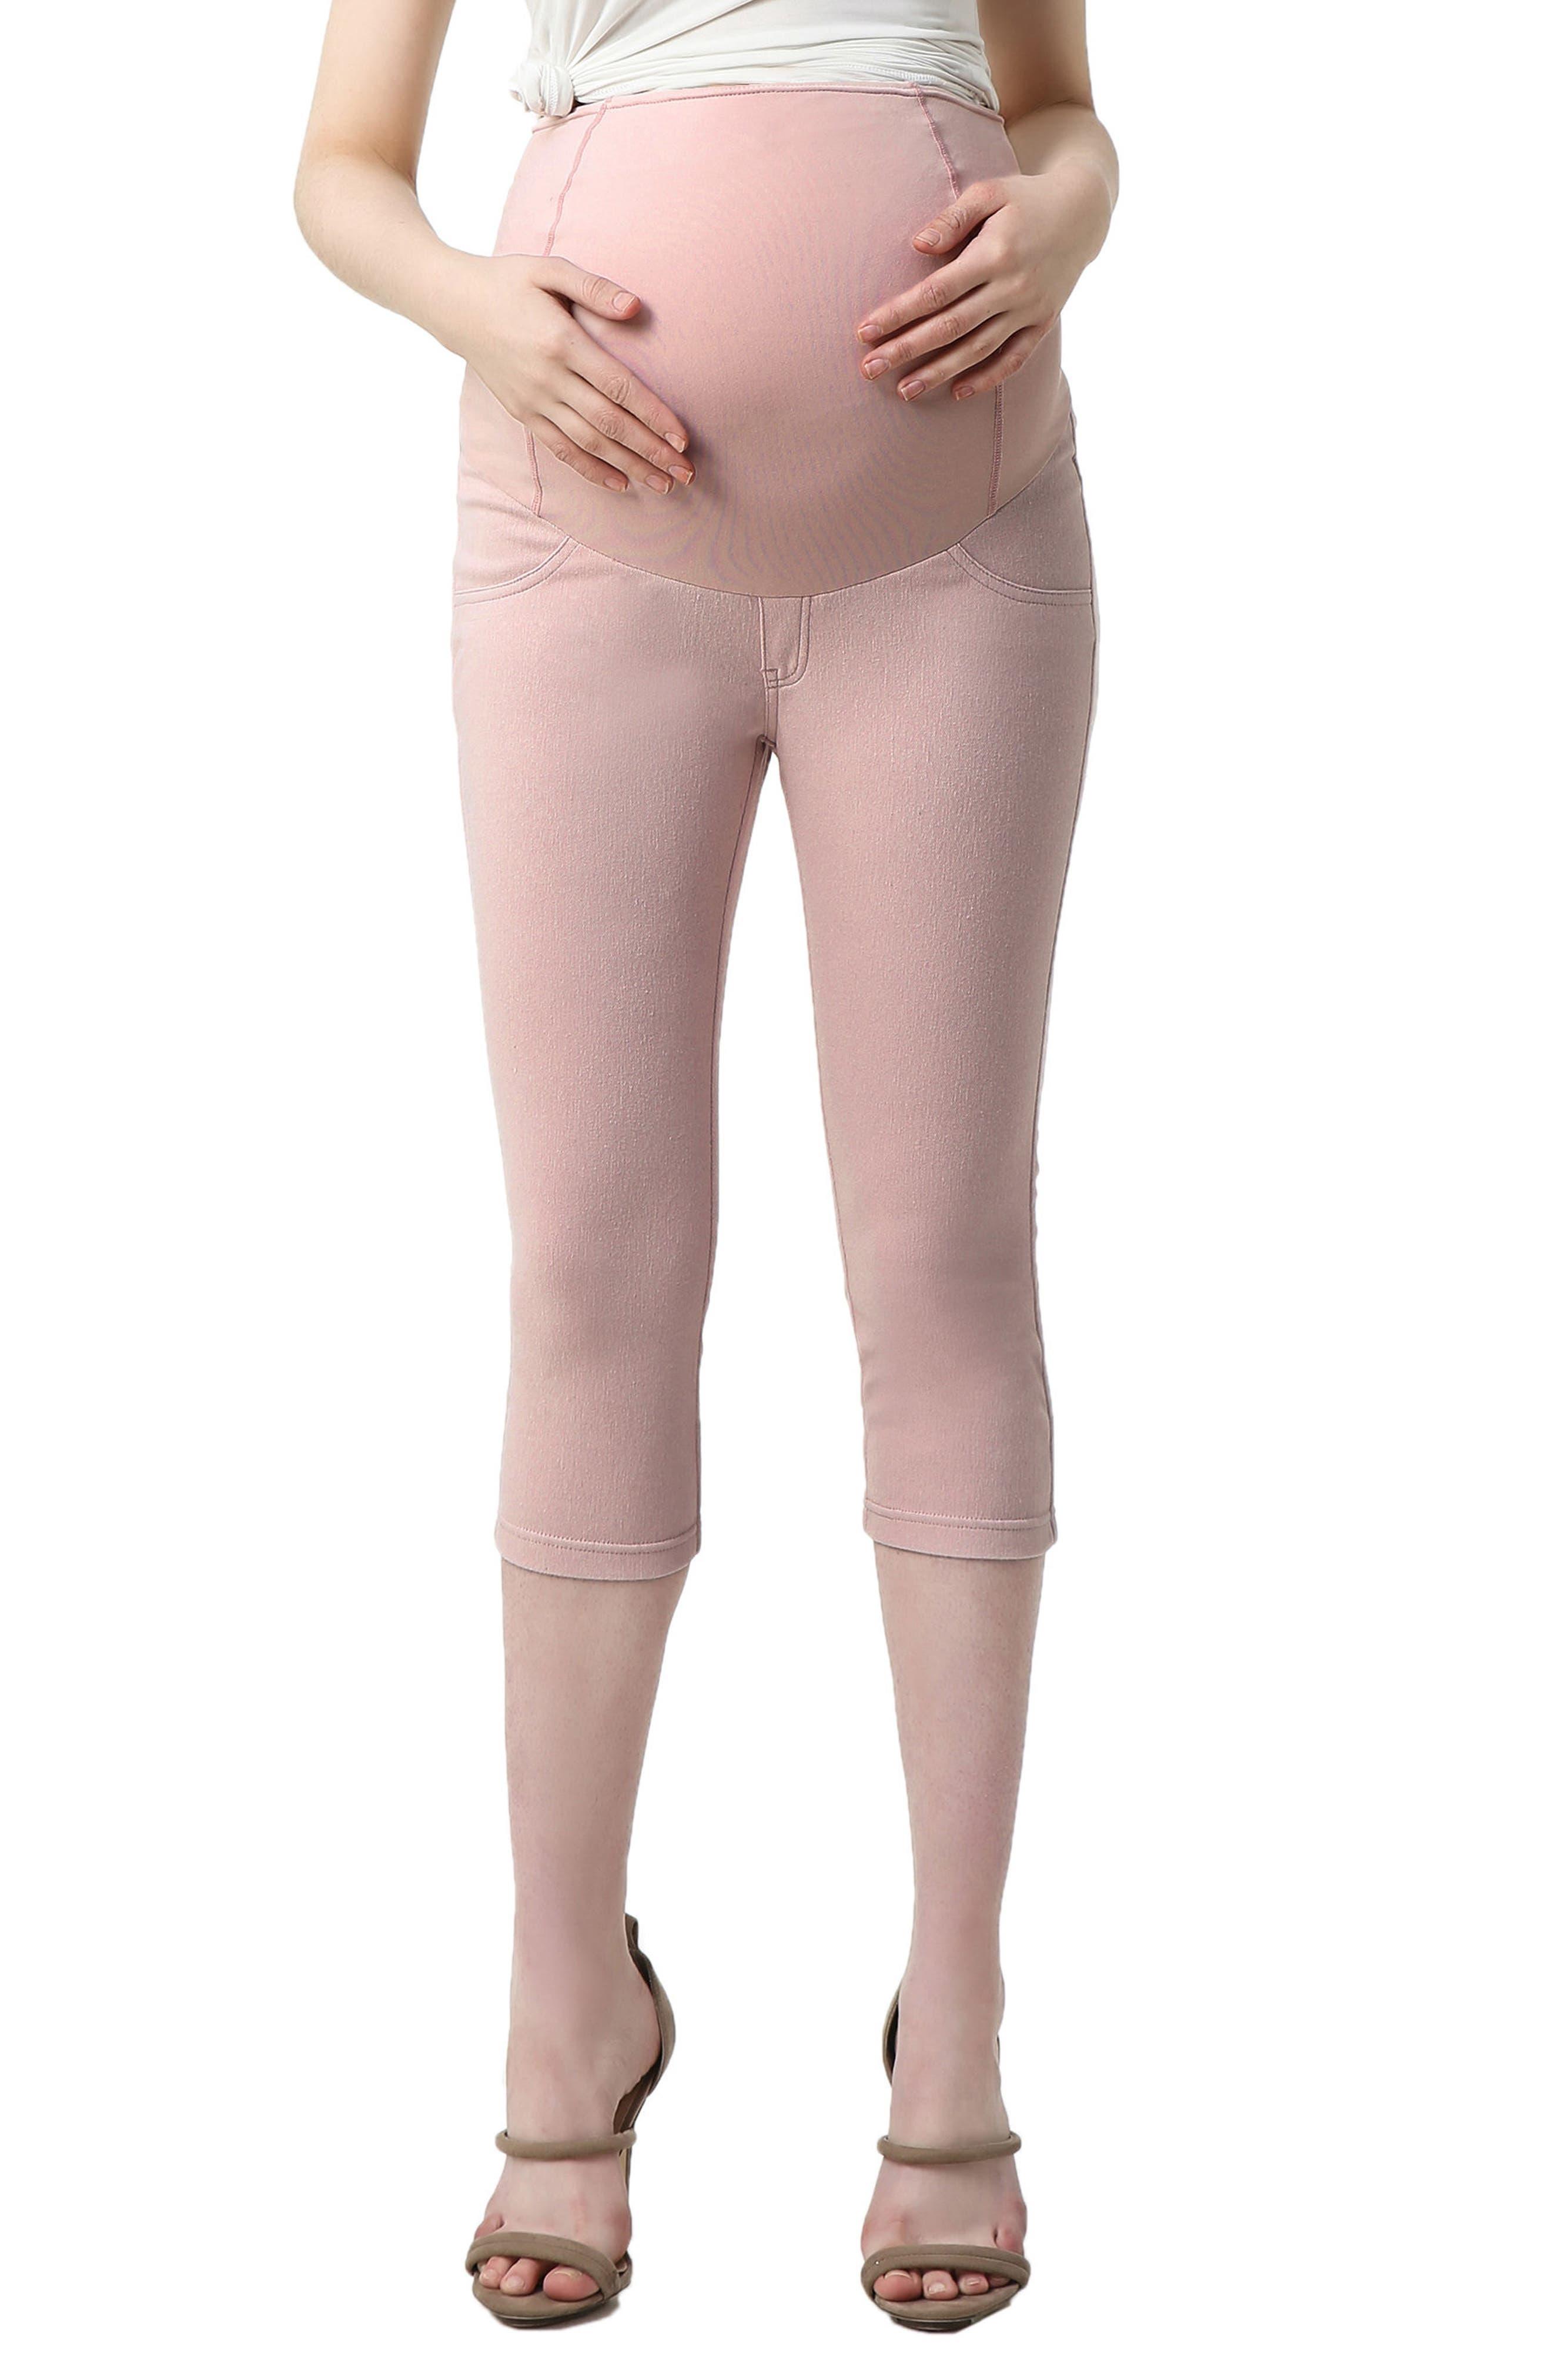 Kimi And Kai Melody Capri Denim Maternity Leggings, Pink